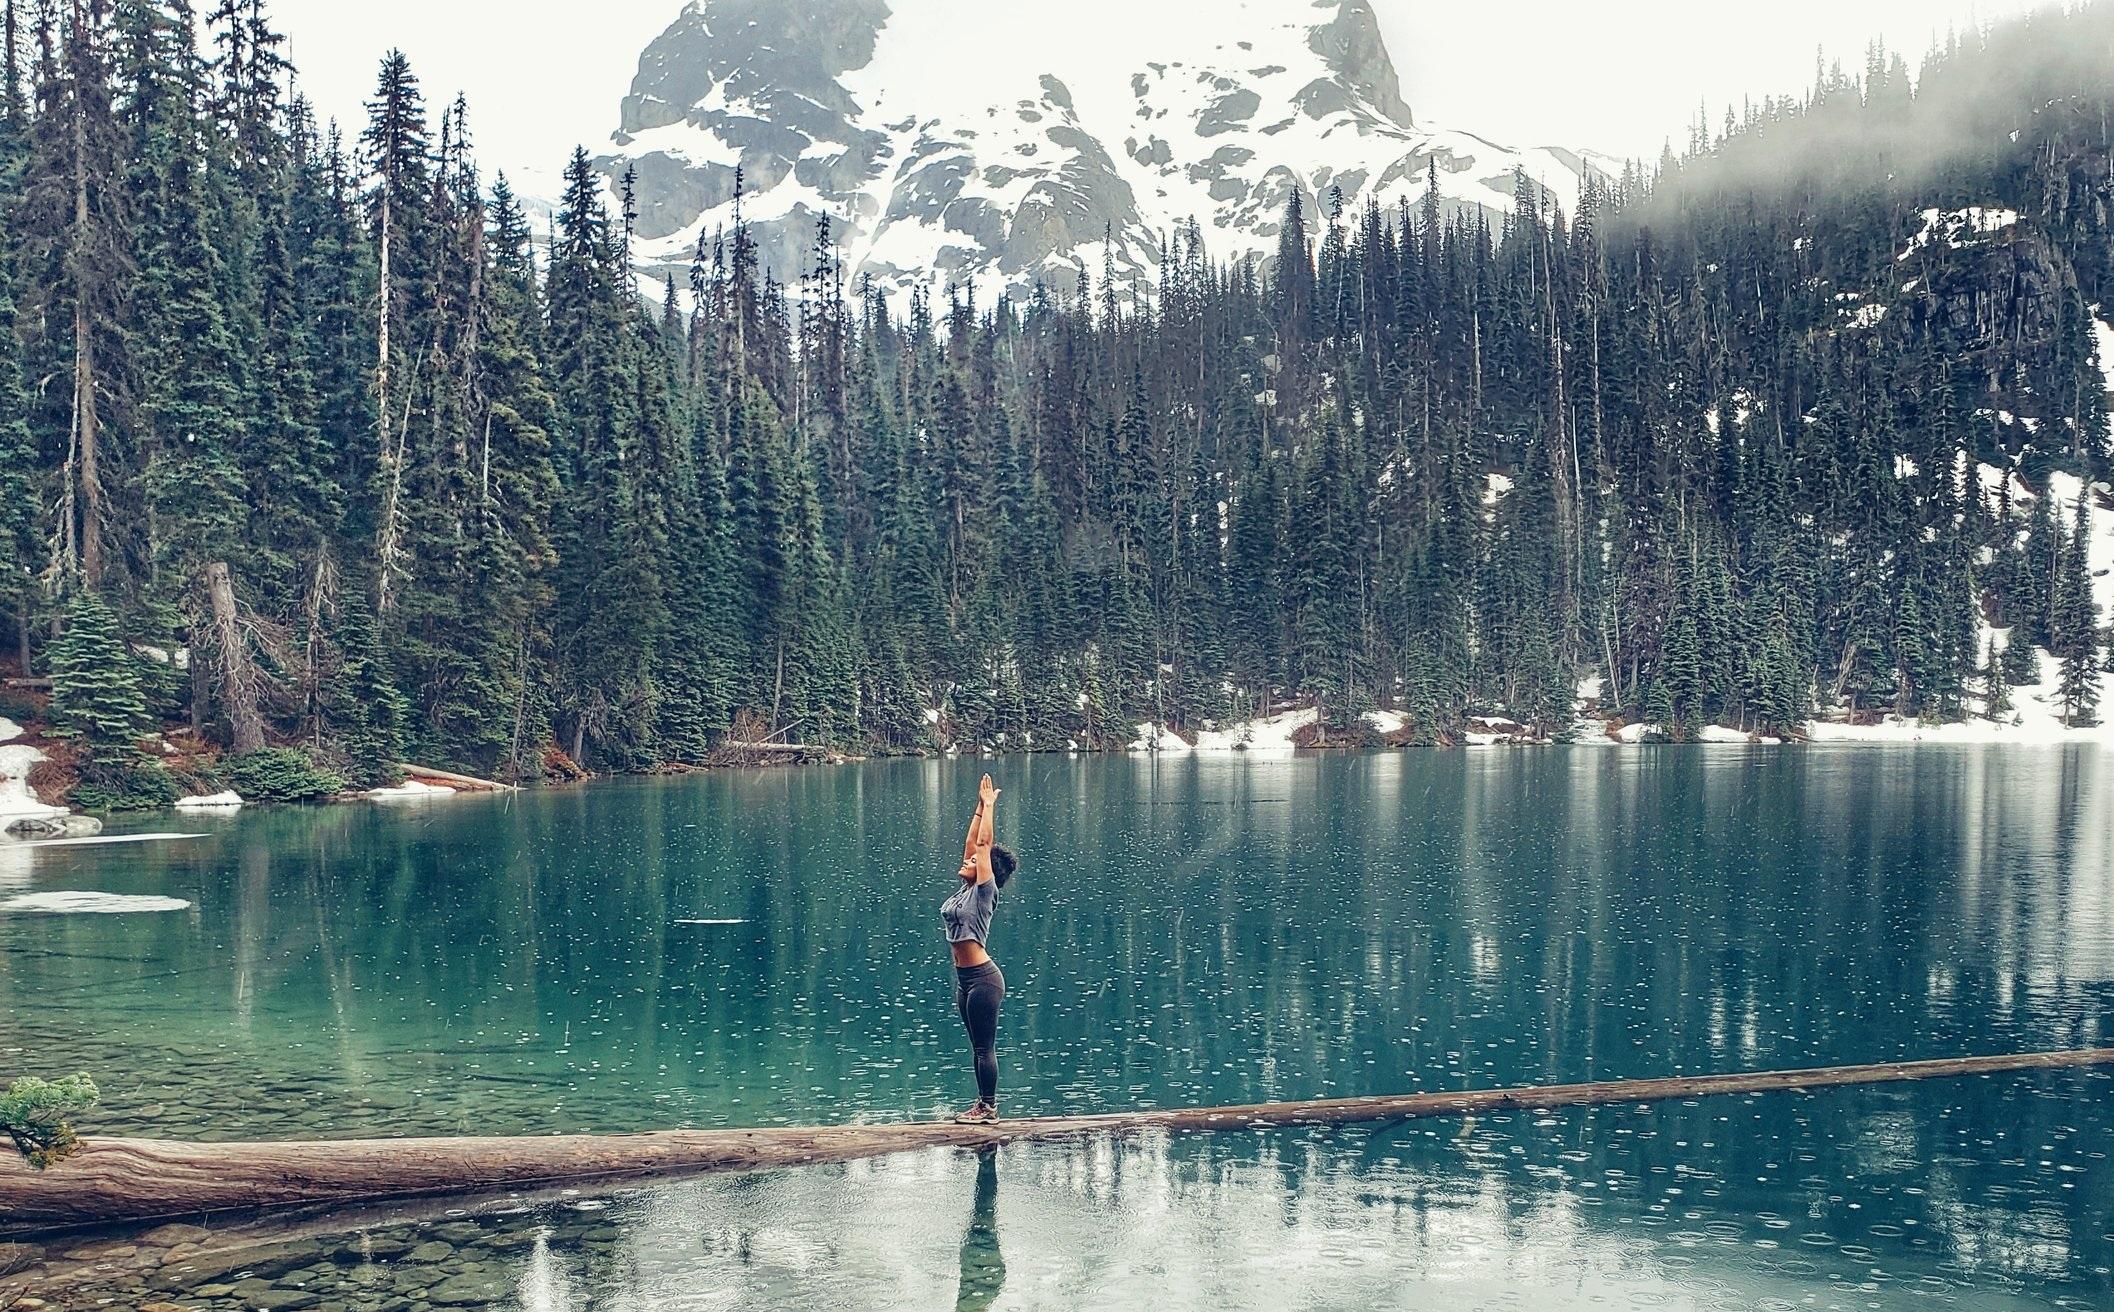 You can do yoga anywhere life takes you